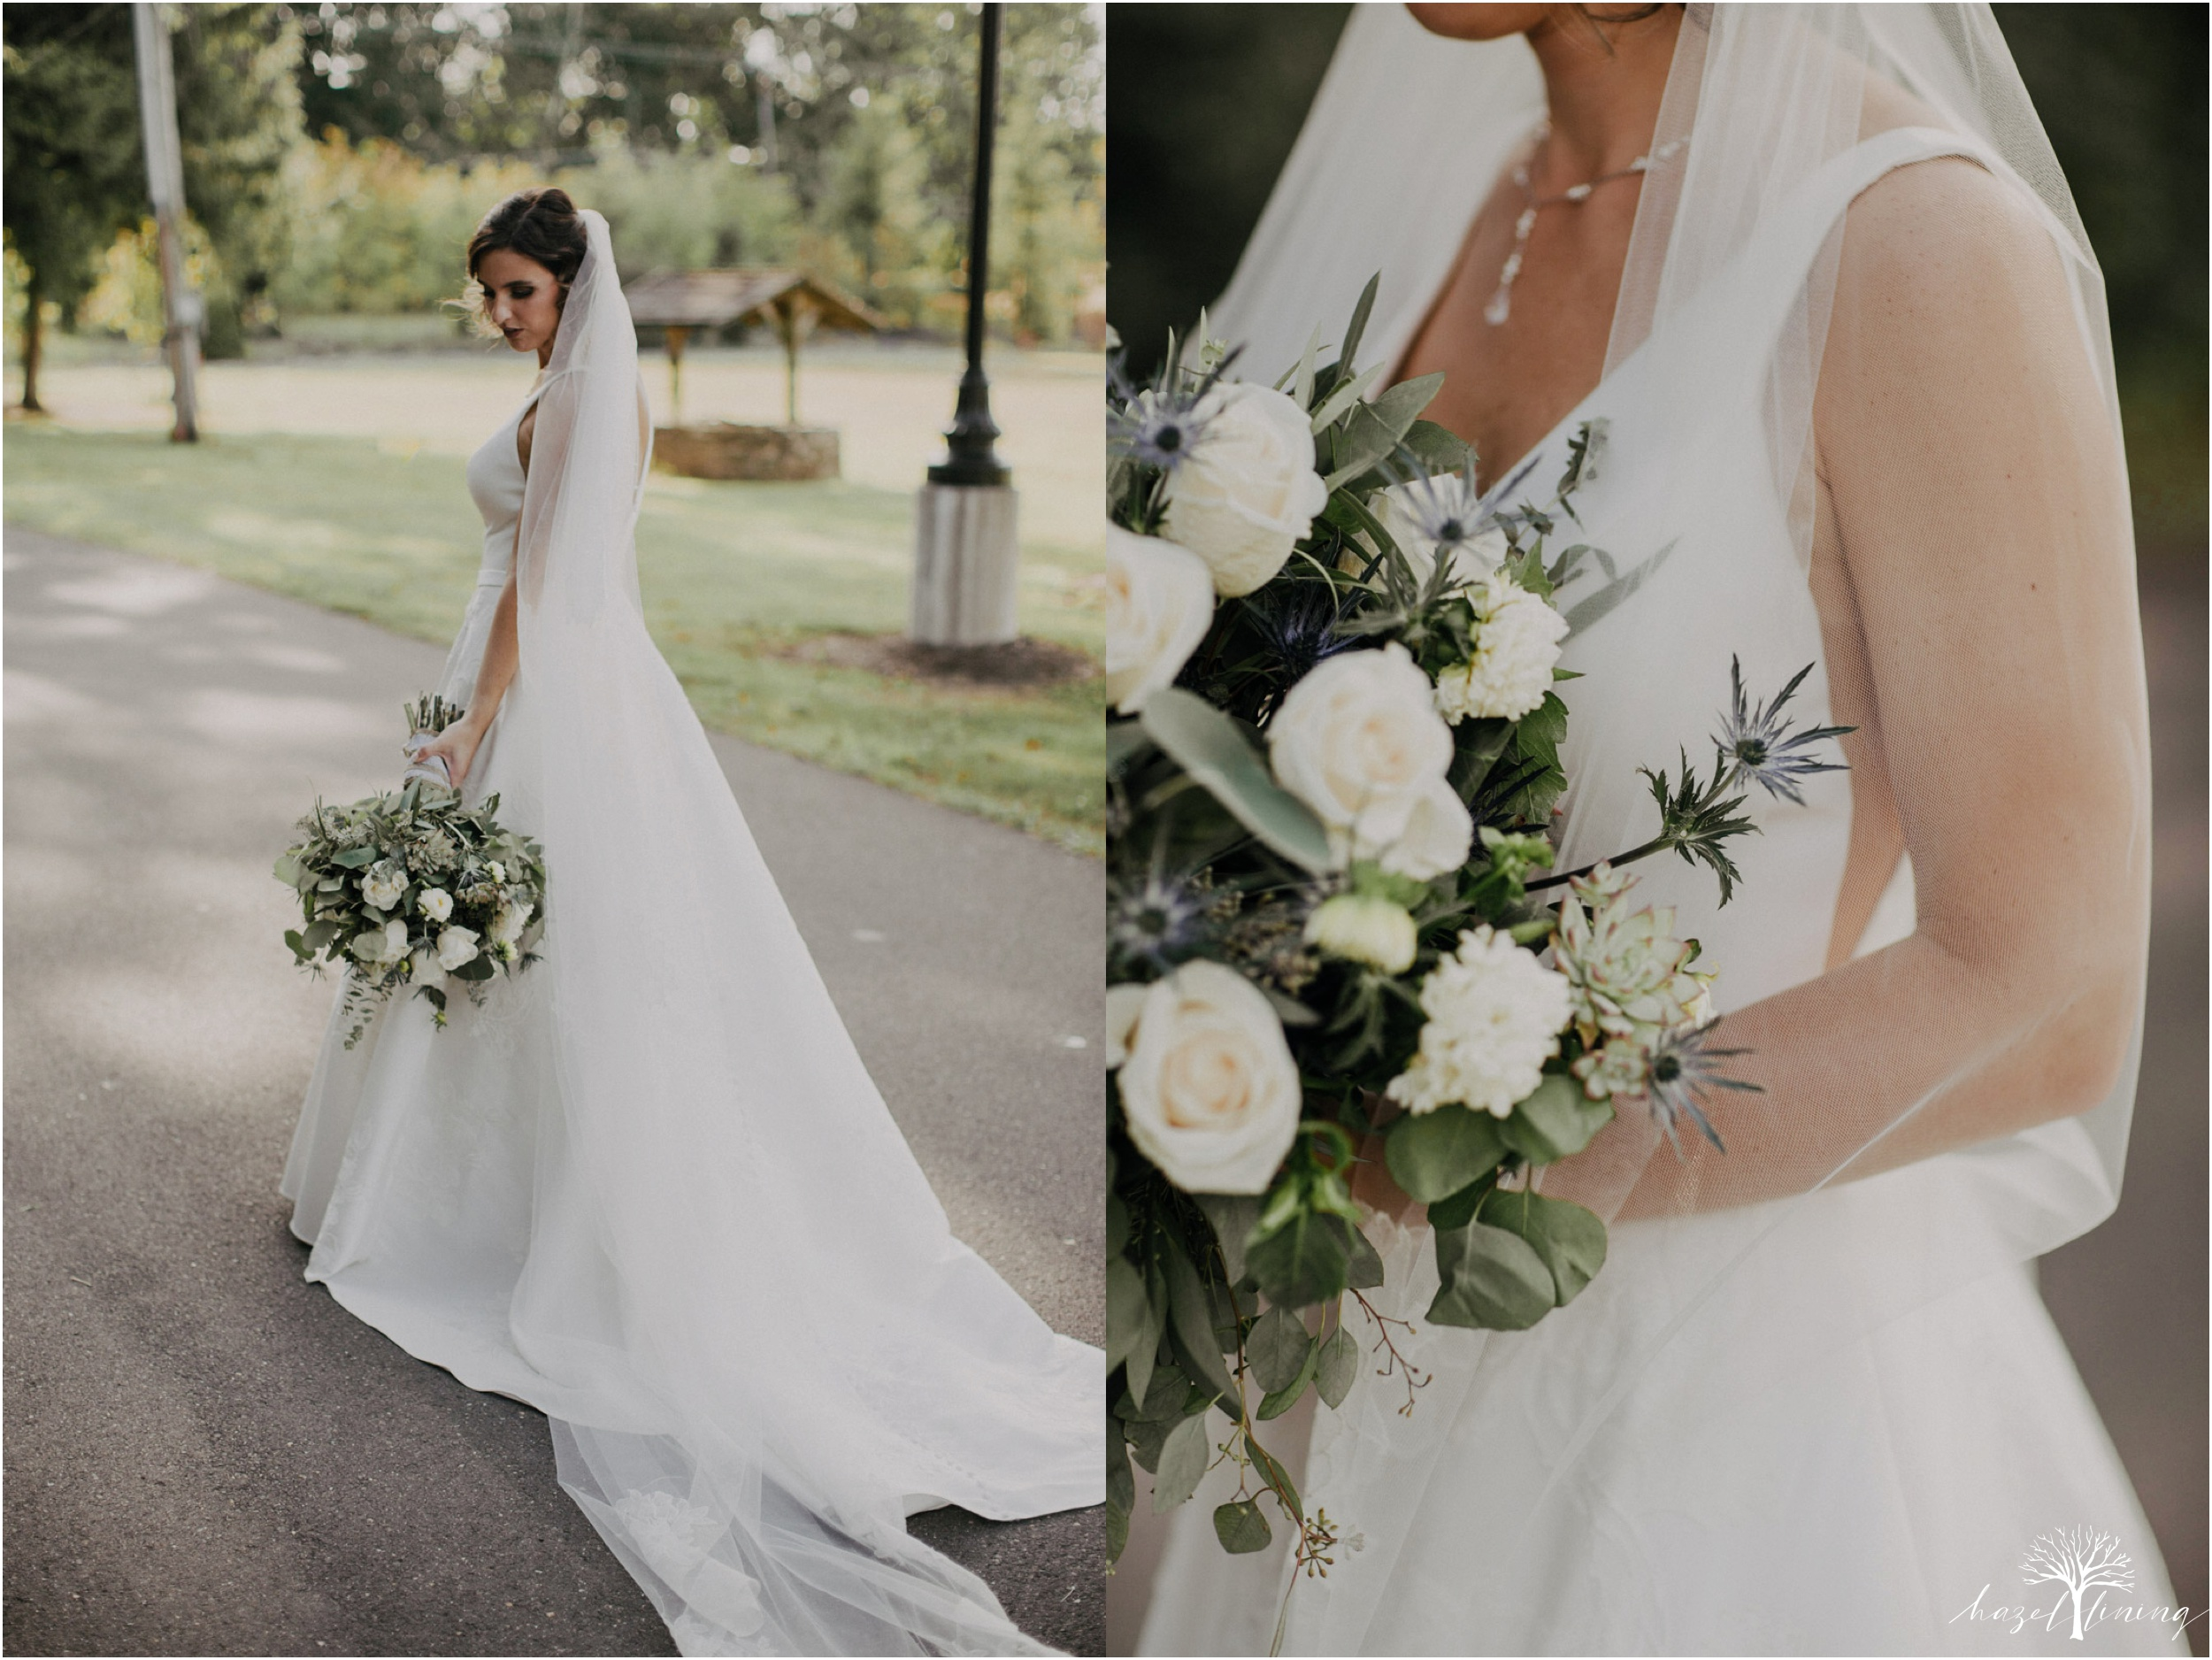 maureen-hepner-anthony-giordano-rose-bank-winery-newtow-pennsylvania-luxury-summer-wedding-hazel-lining-photography-destination-elopement-wedding-engagement-photography_0100.jpg